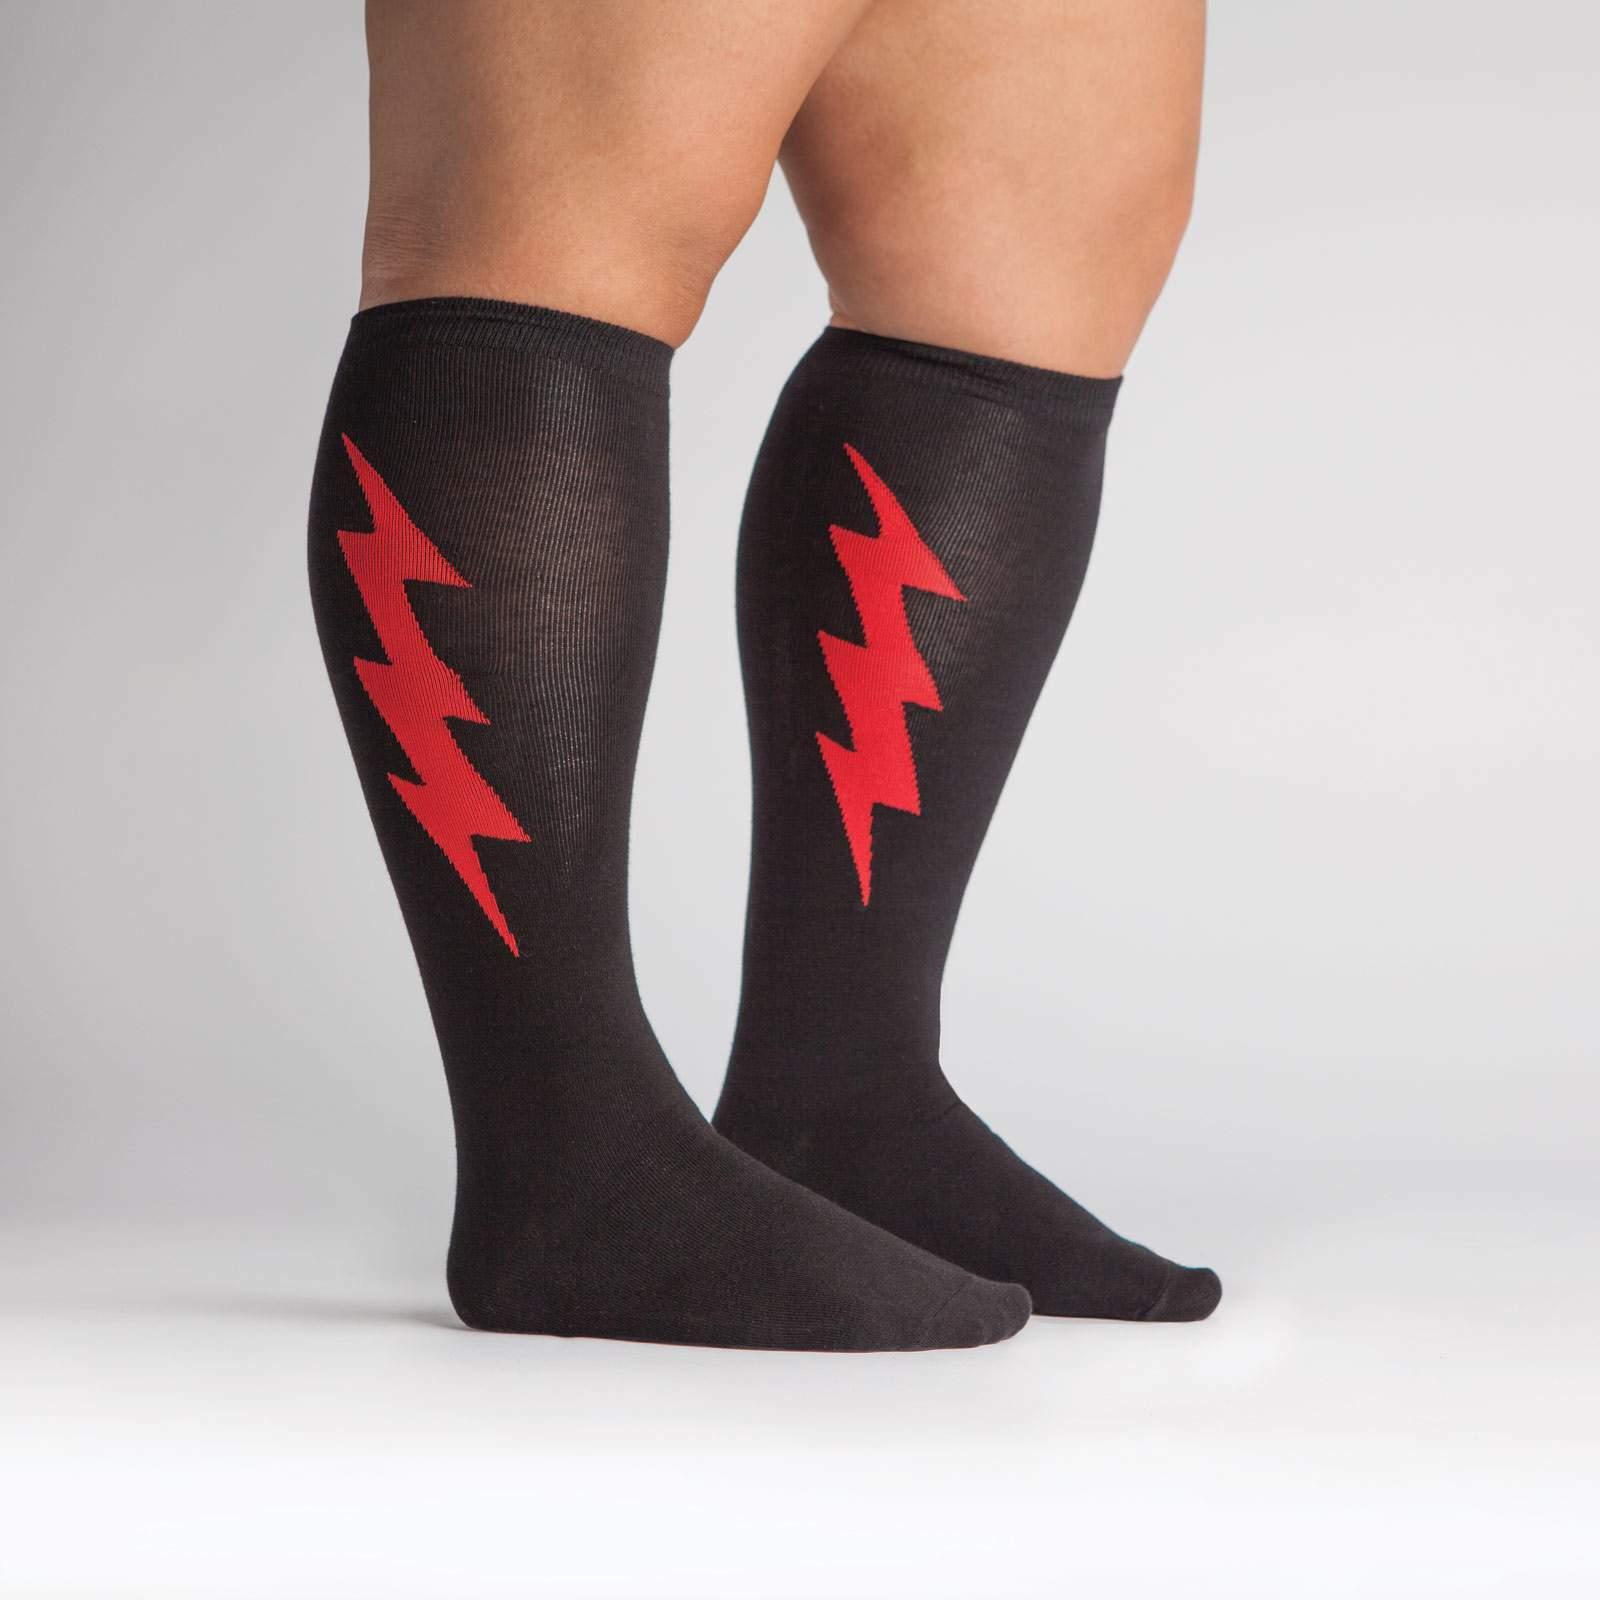 model side view of Super Hero! Red and Black - Wide Calf - Super Hero Knee High Socks - Unisex